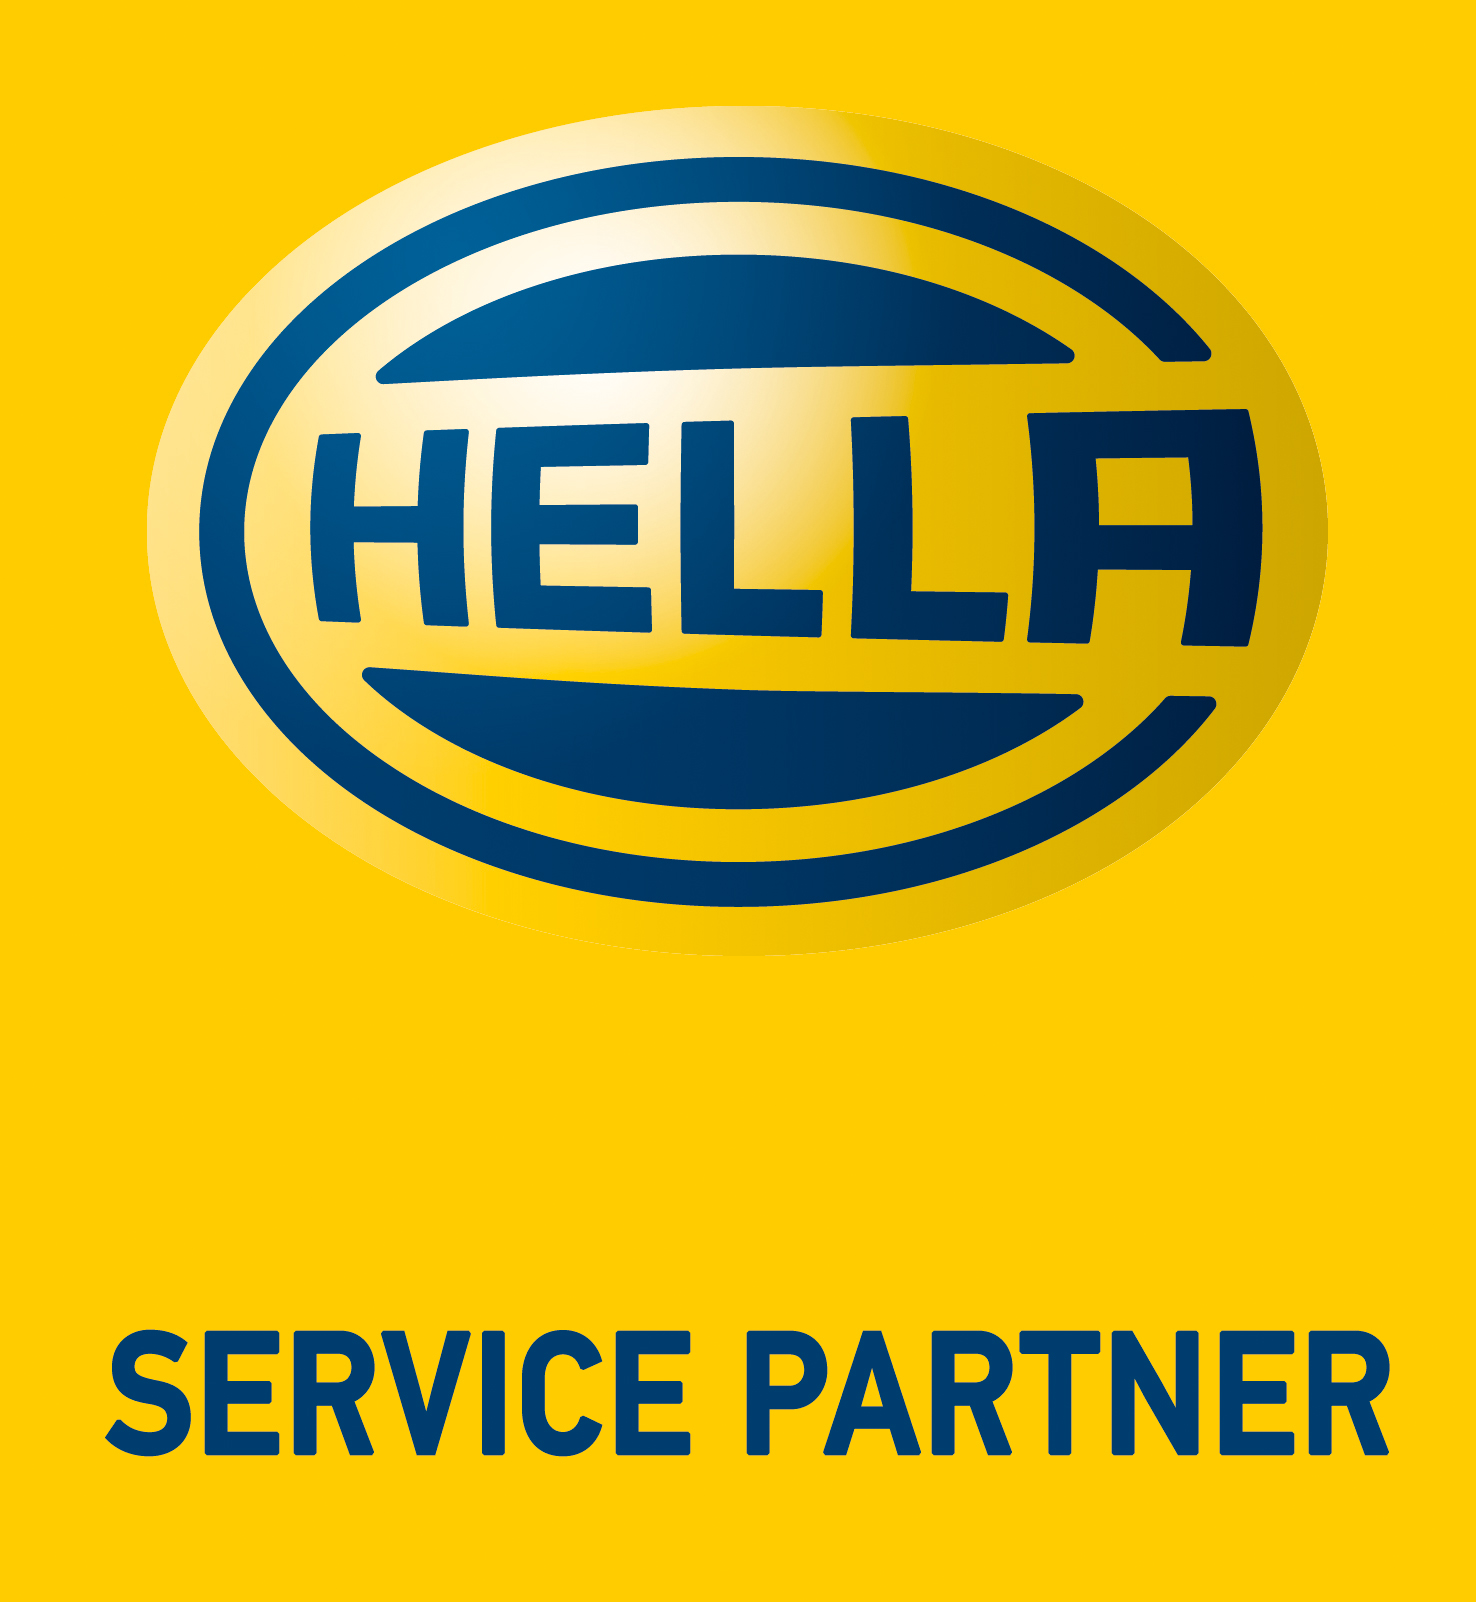 Autoteknicom ApS - Hella Service Partner logo